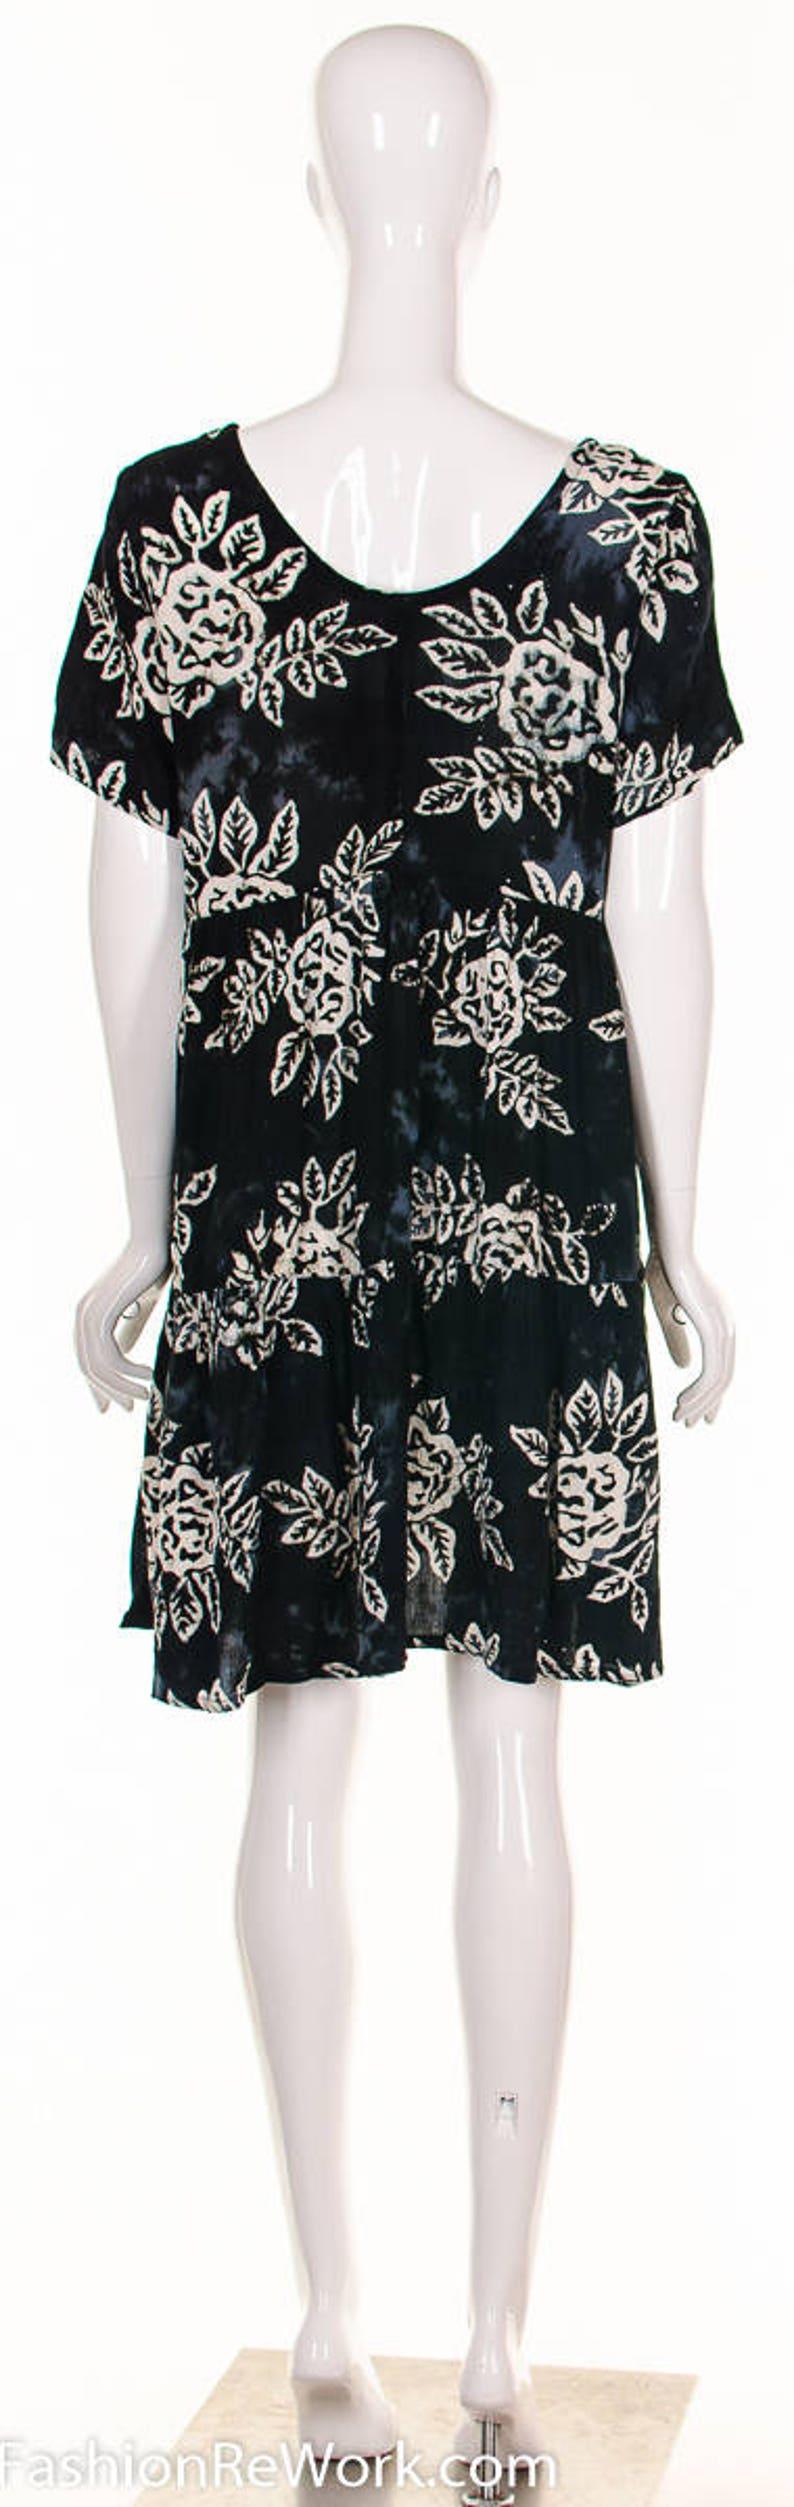 358831cdd23 90 s Batik BABY DOLL HAWAIIAN Dress Rose Print Dress Tie